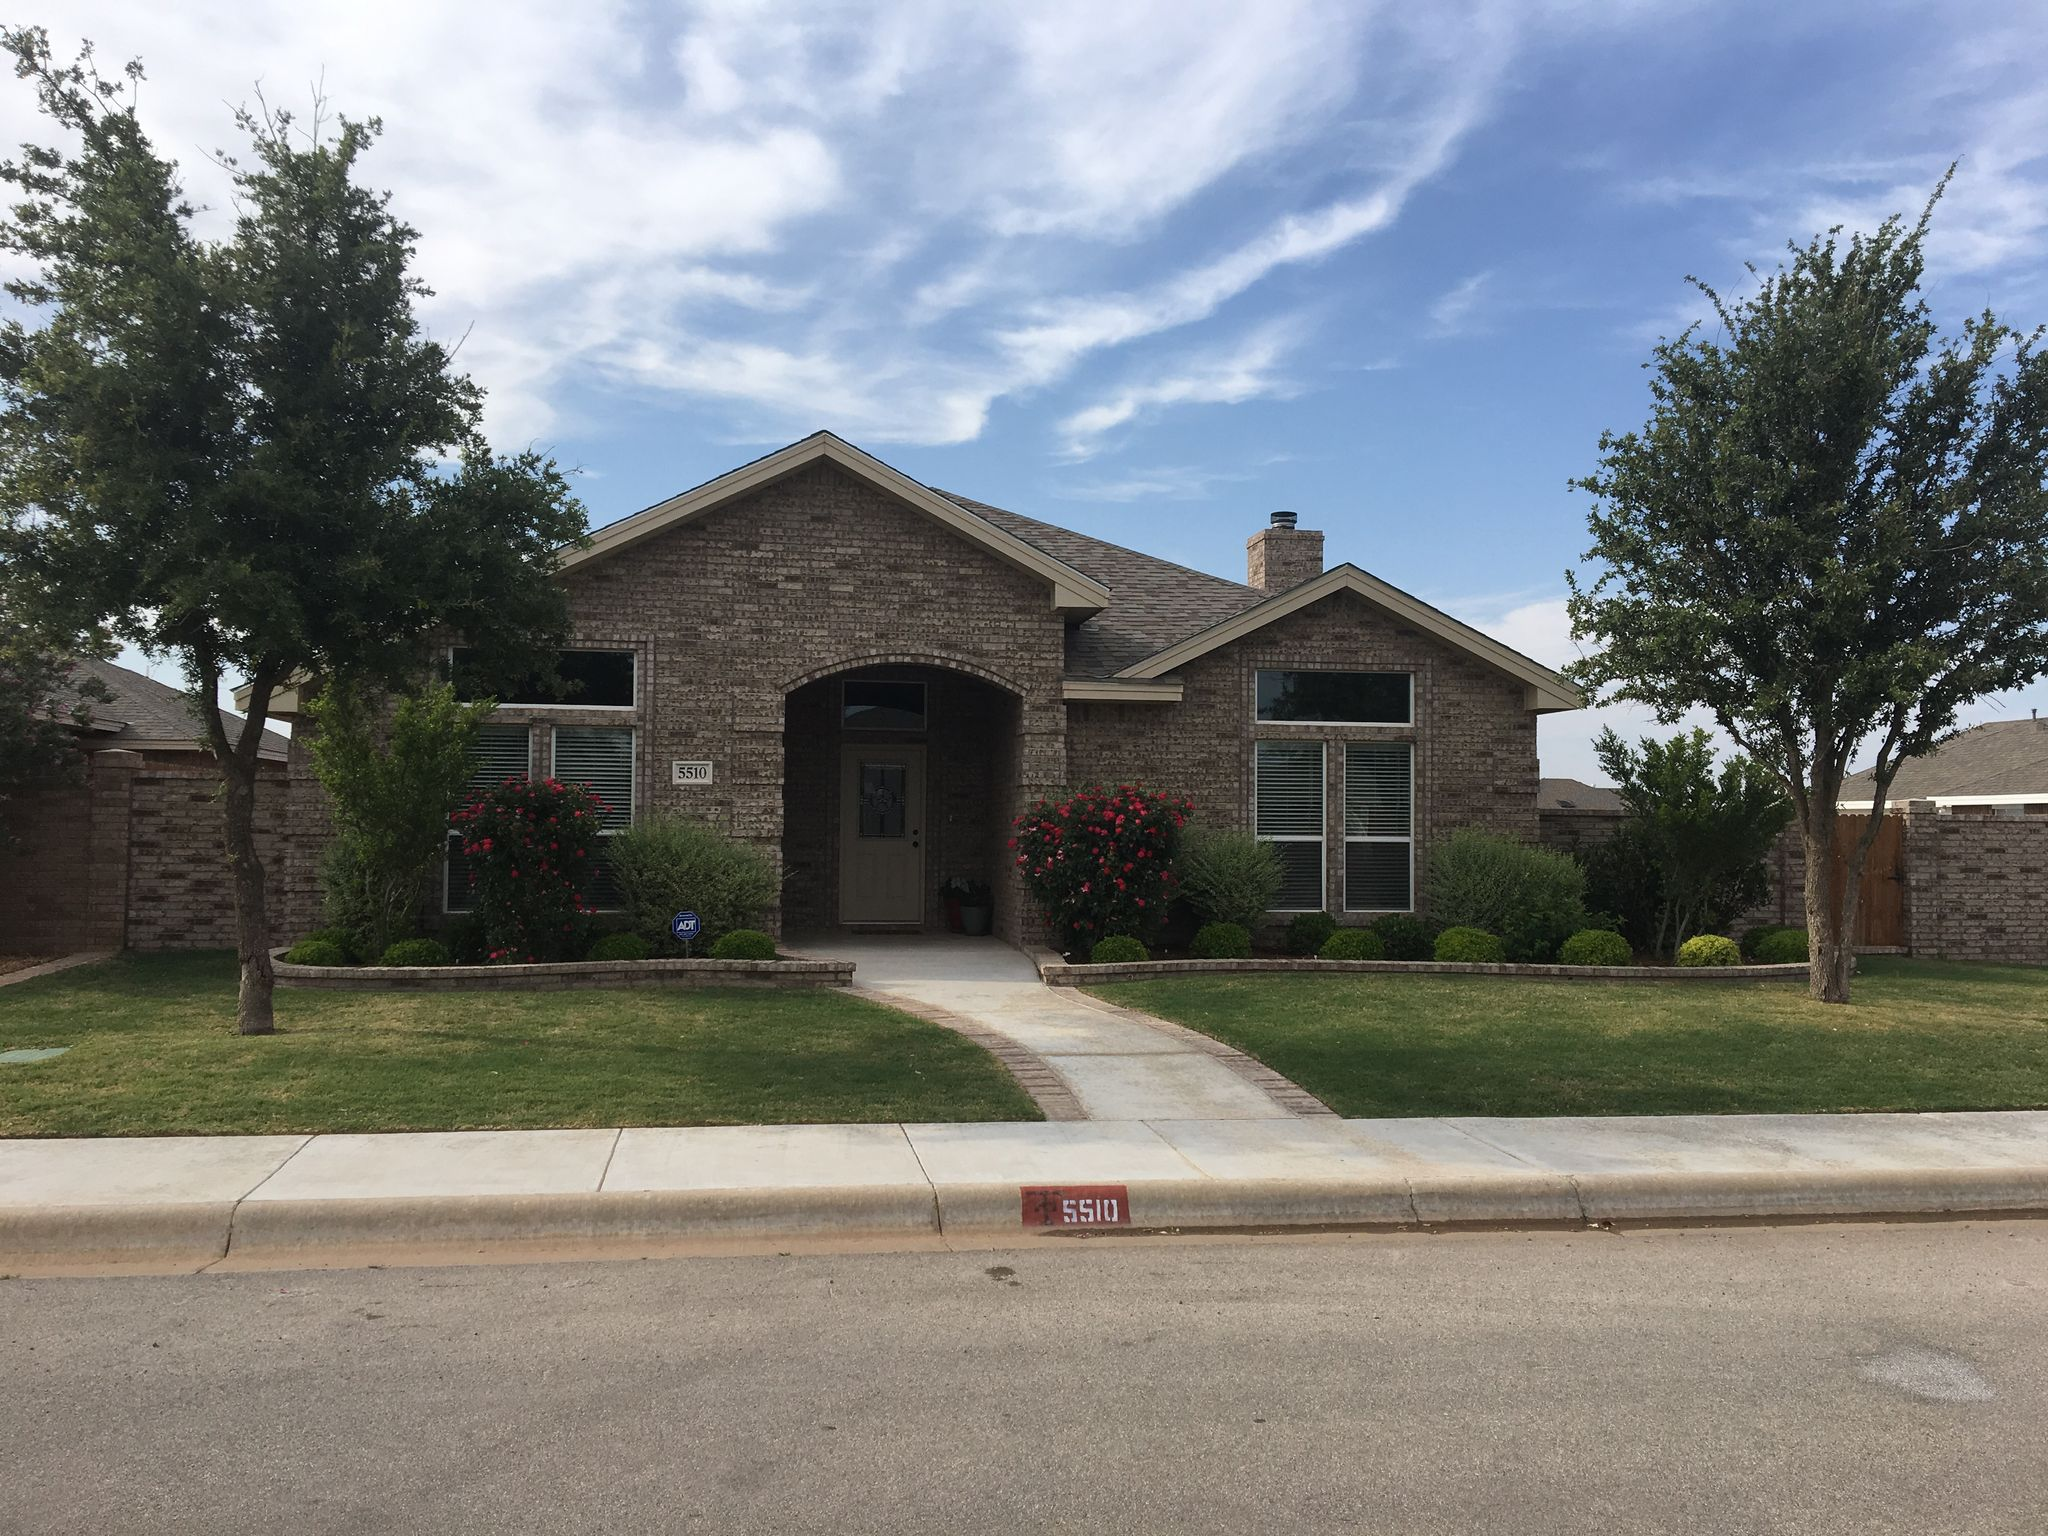 5510 Los Patios Dr Midland TX Estimate and Home Details